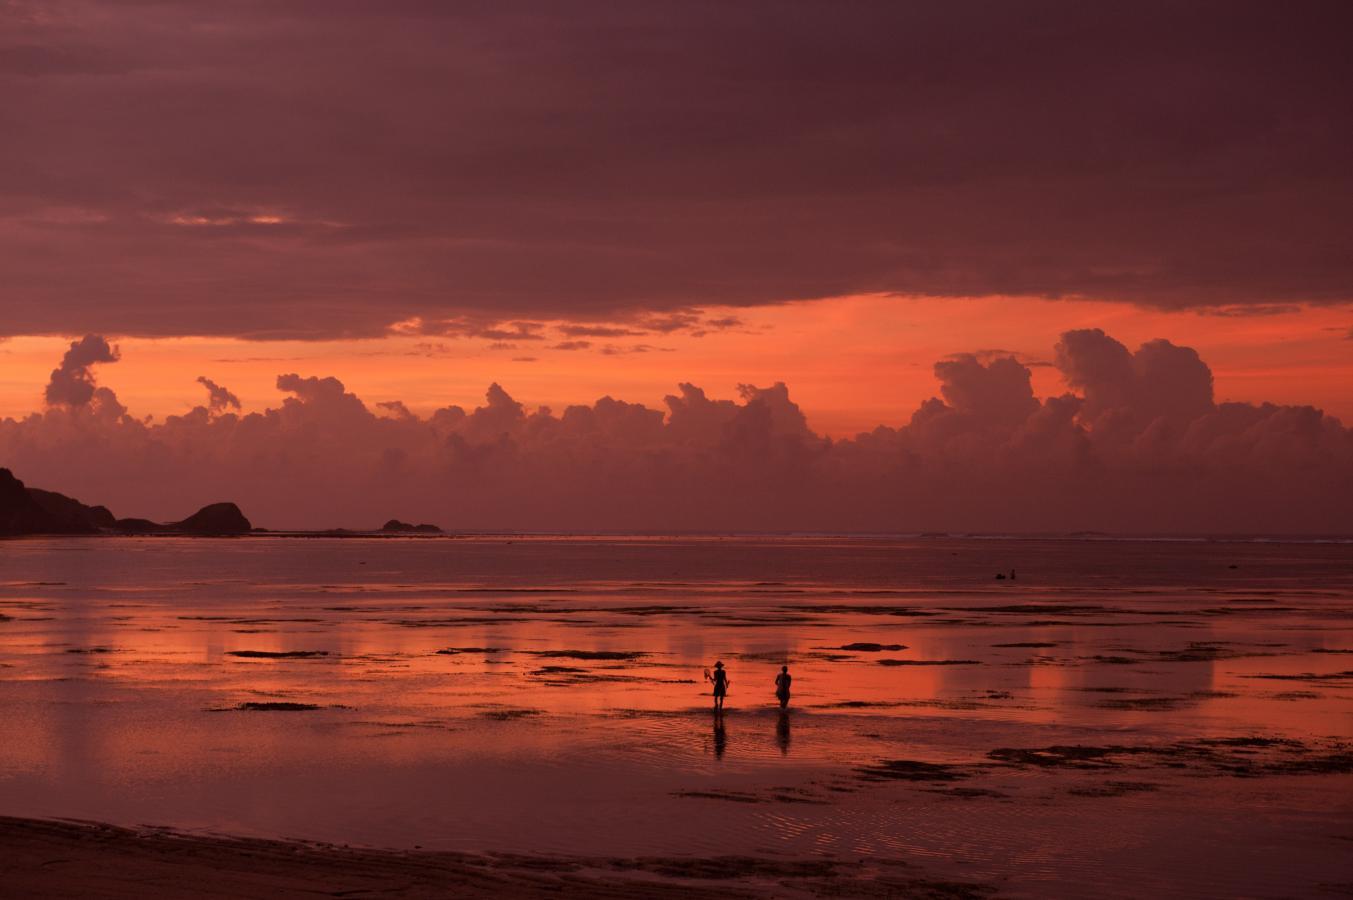 sunrise-at-kuta-lombok-2010